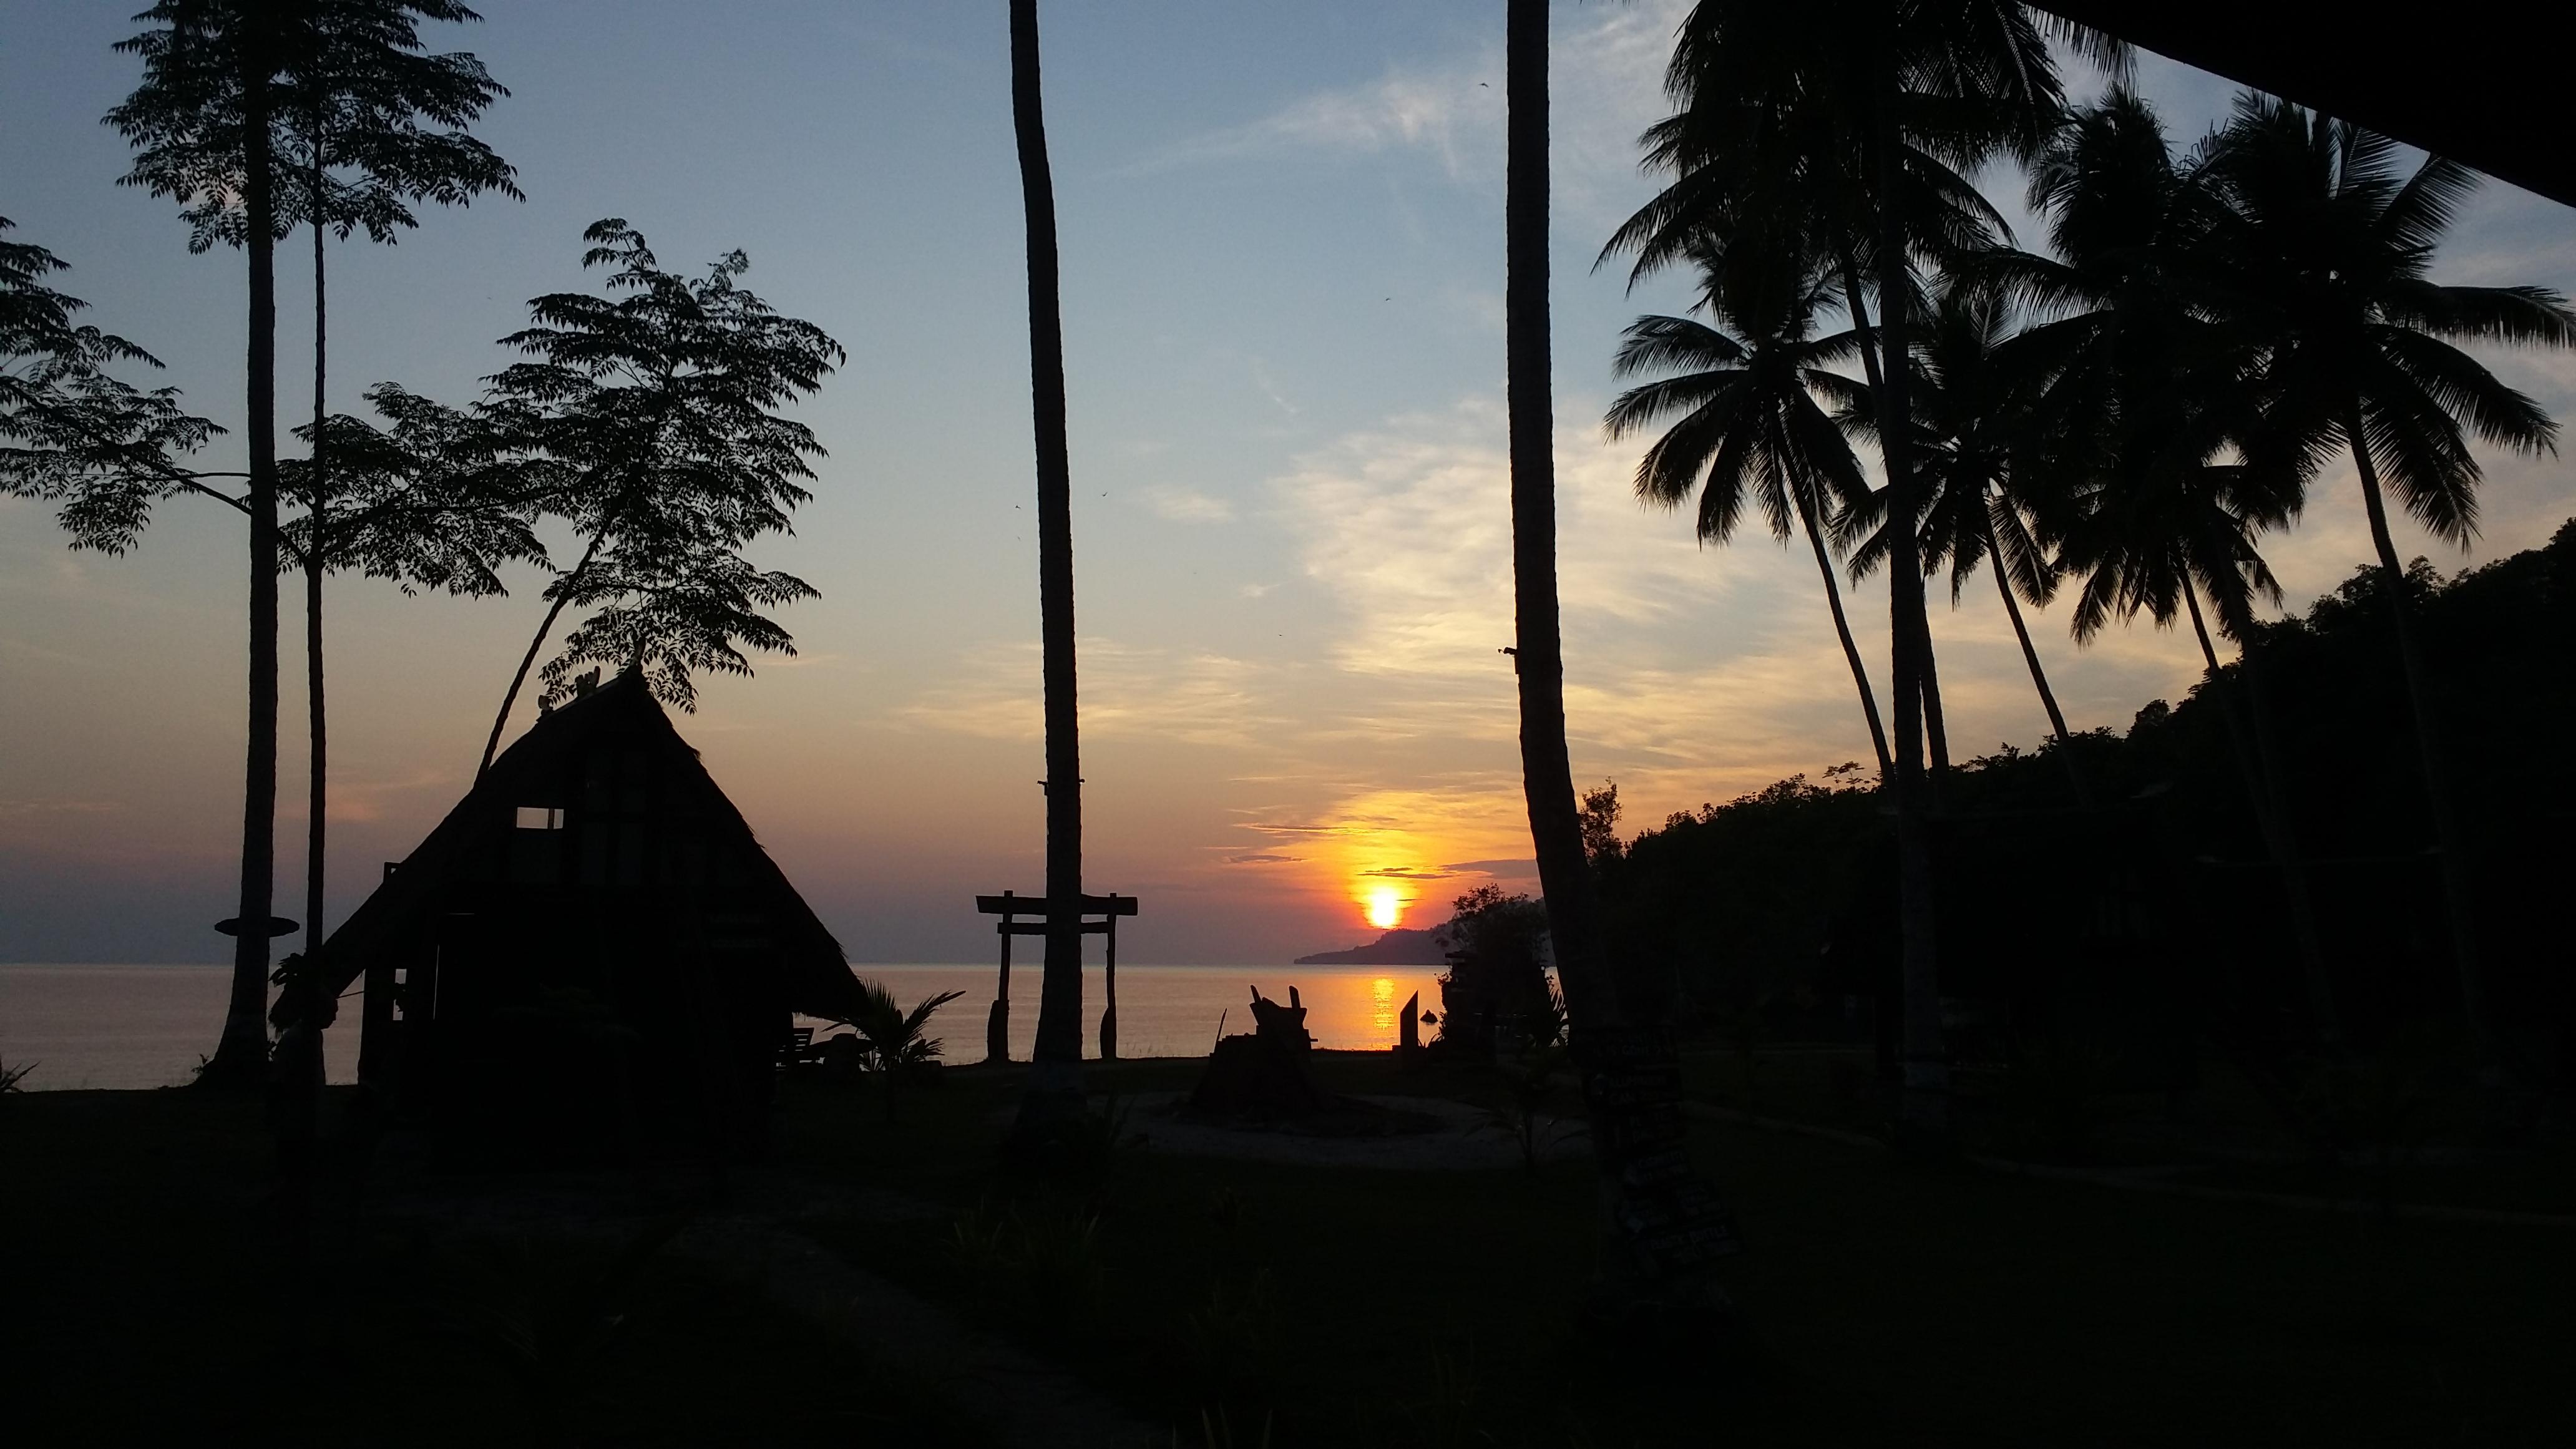 kalimantan wildlife diversity tour orangutan wildlife dayak culture, rain forest jungle trek guide trips borneo indonesia